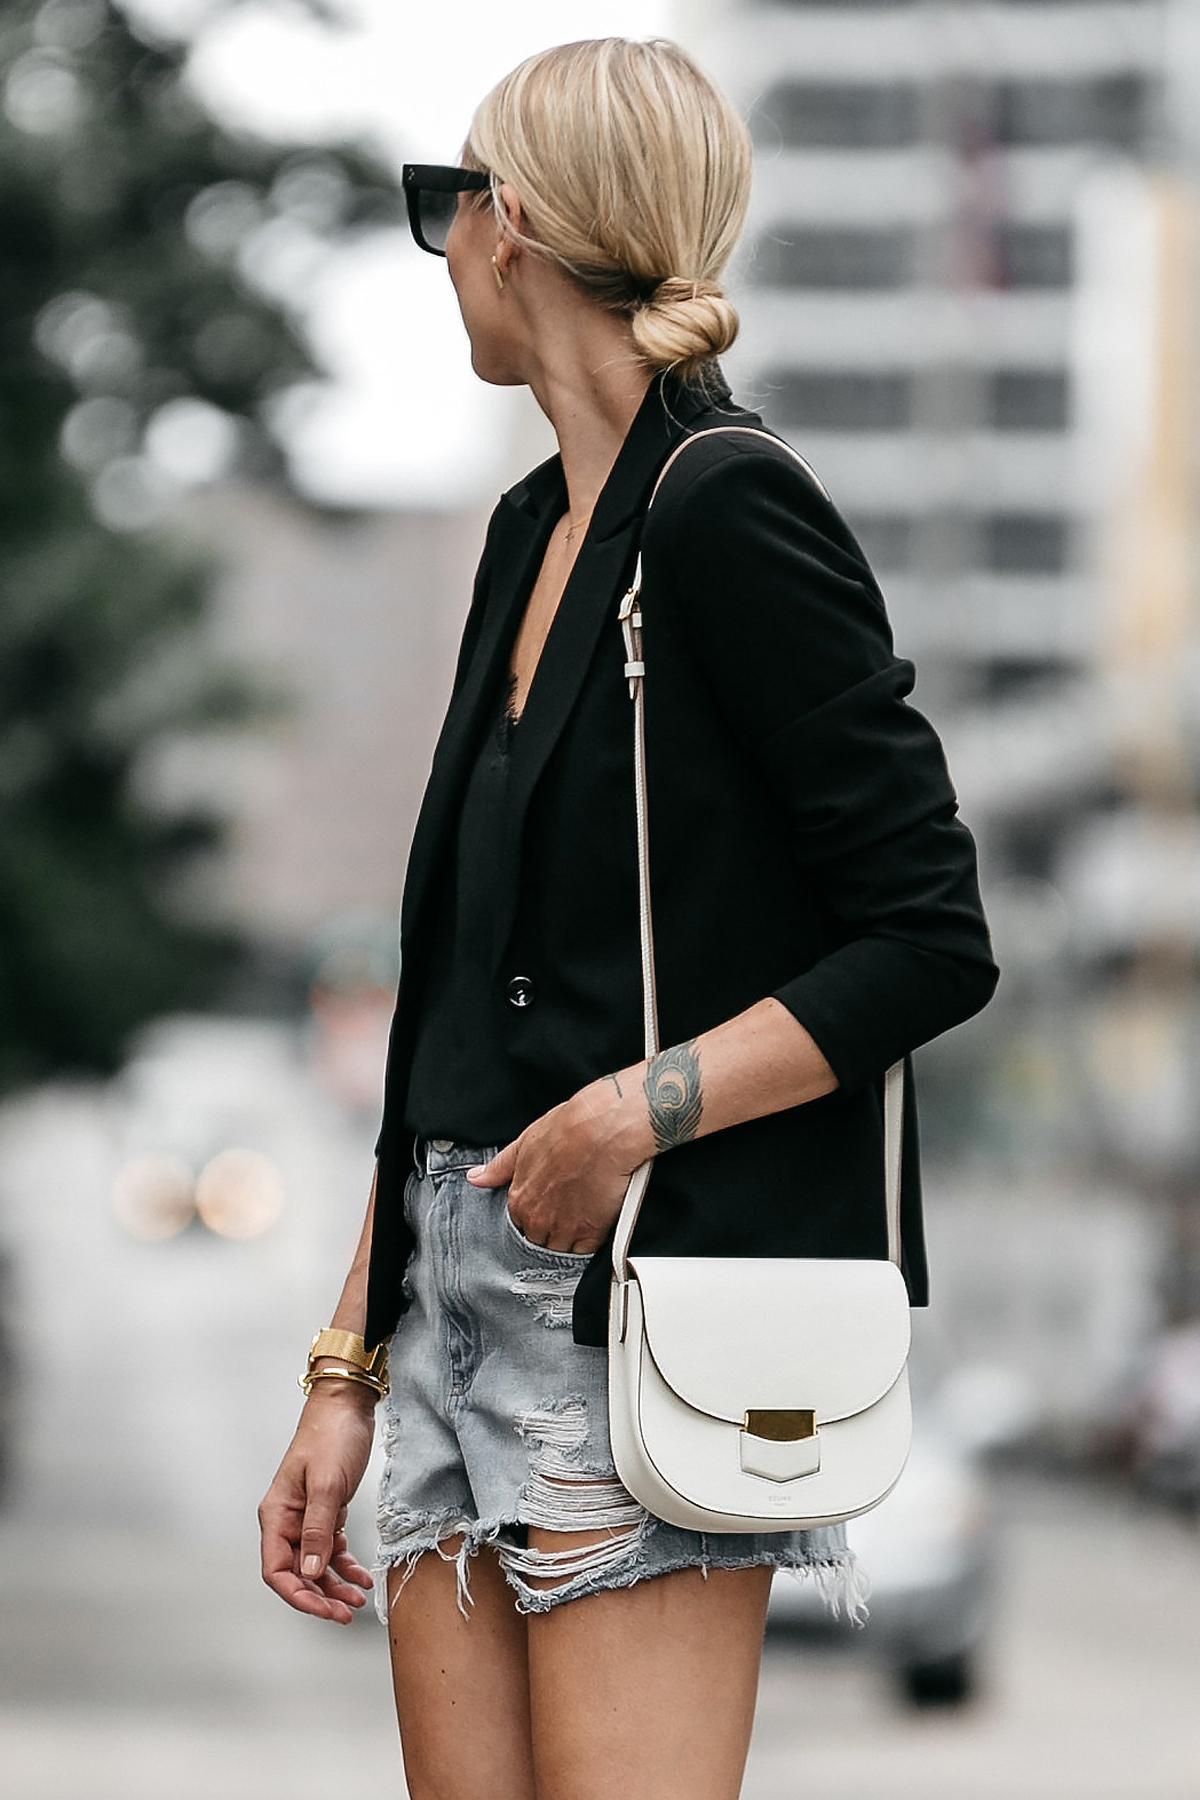 Blonde Woman Wearing Nordstrom Black Blazer Anine Bing Black Lace Cami Topshop Denim Cutoff Shorts Outfit Celine White Trotteur Street Style Dallas Blogger Fashion Blogger